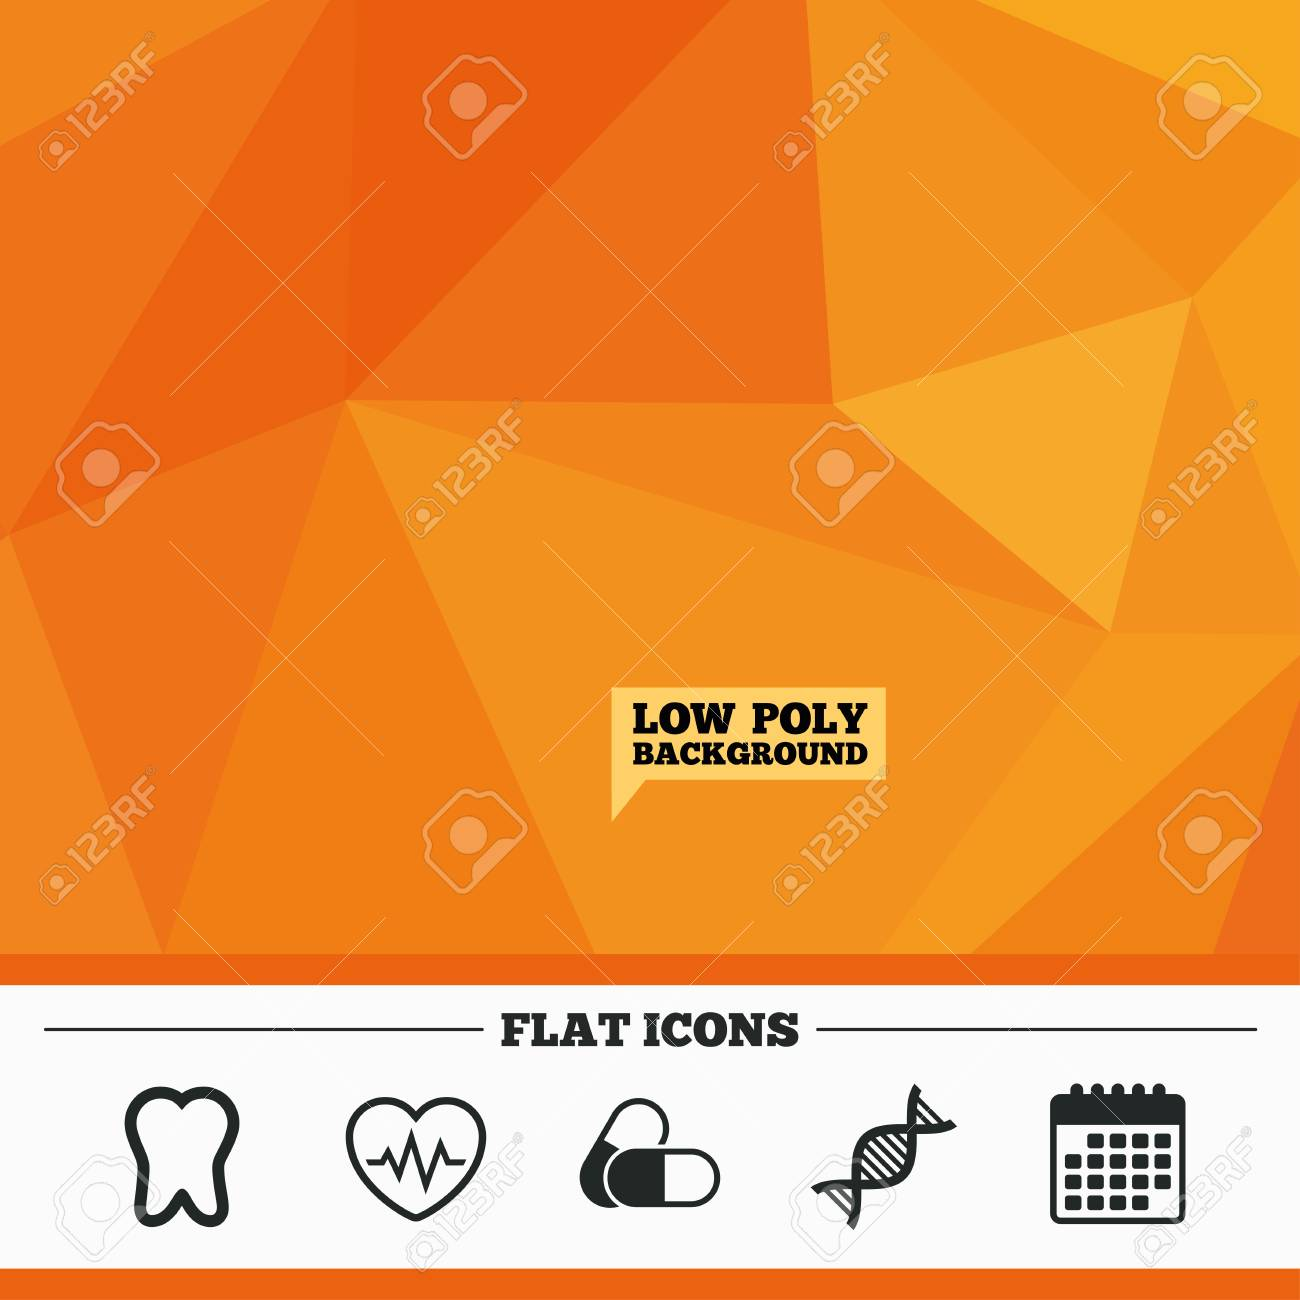 Baja Poli Fondo Naranja Triangular. Iconos De Maternidad. Píldoras ...